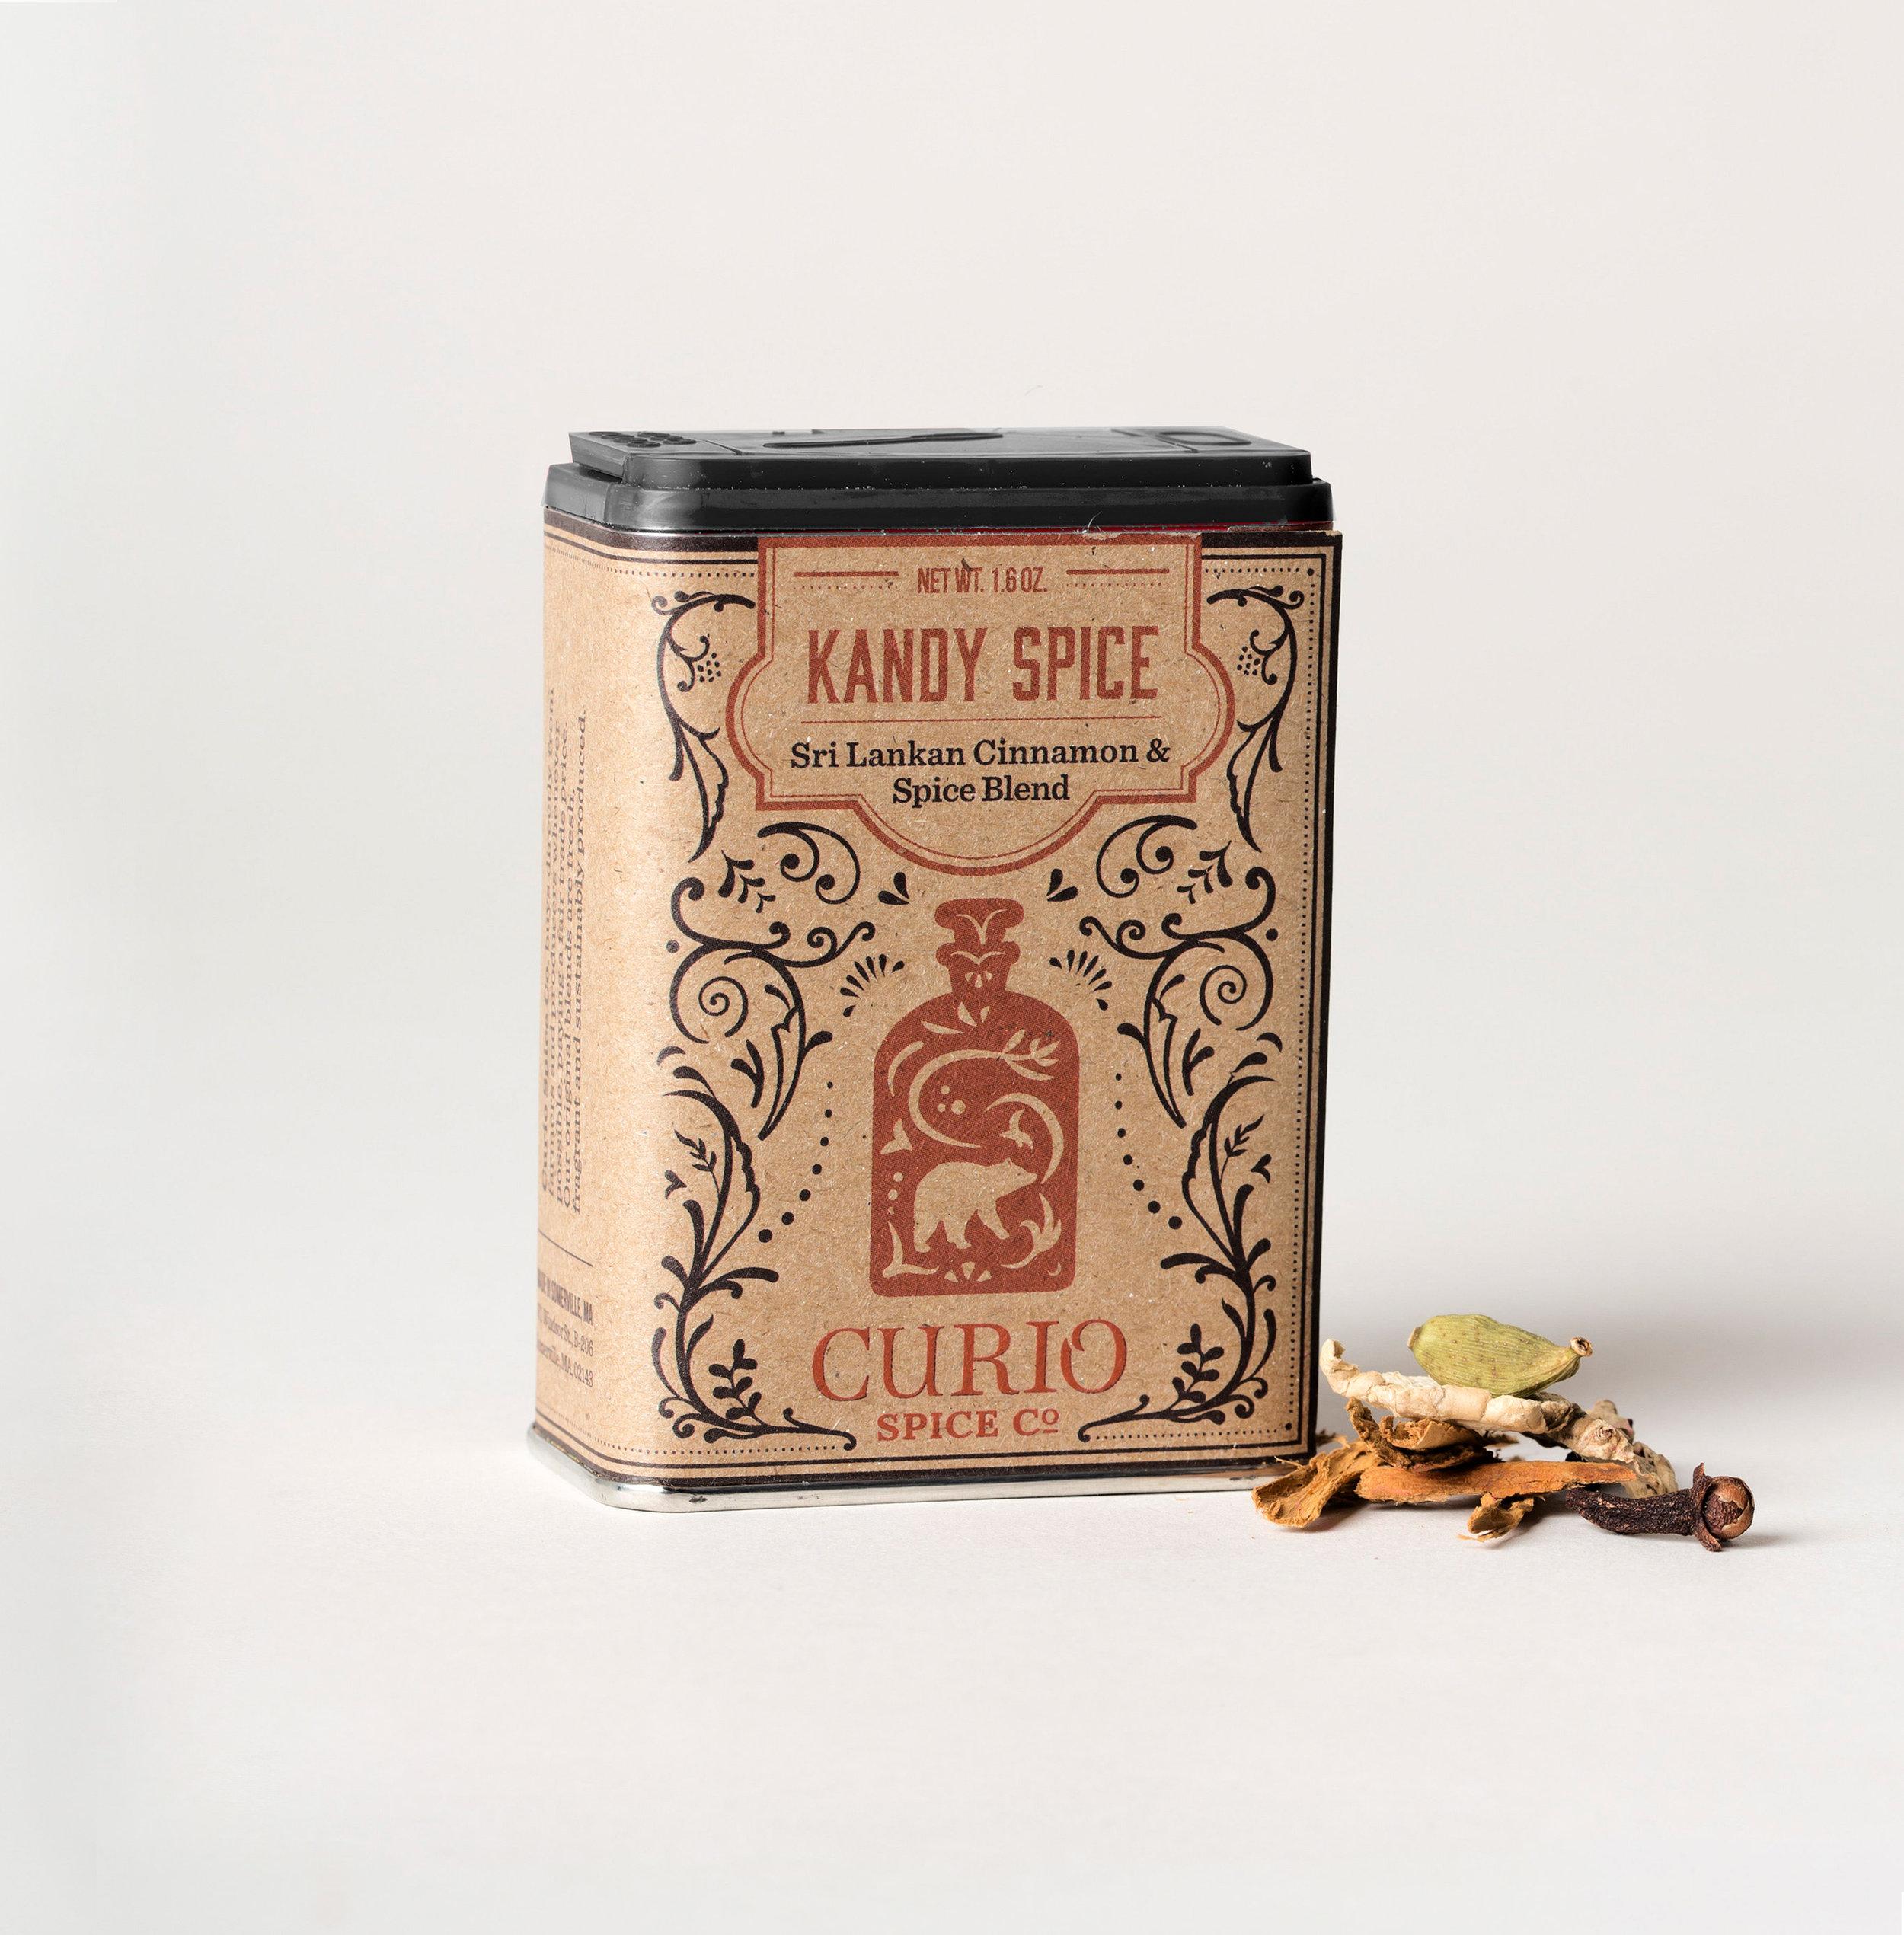 Kandy Spice - a cozy Sri Lankan cinnamon blend